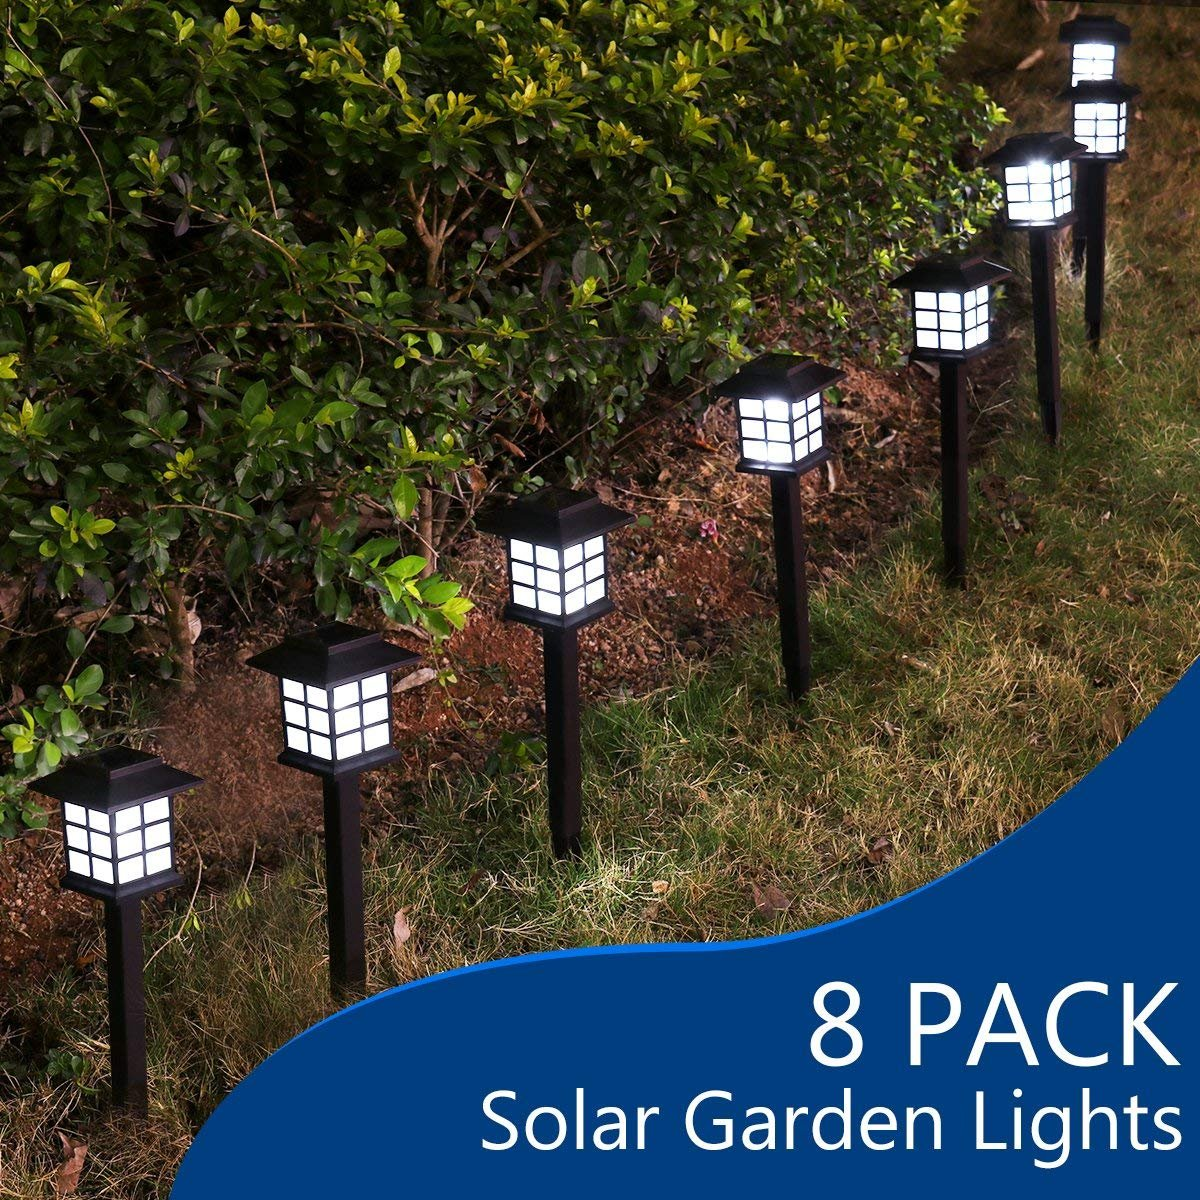 YUNLIGHTS 8pcs Garden Solar Stake Lights Outdoor Solar Pathway Lights Waterproof Solar Landscape Lights for Garden, Path, Yard, Patio, Driveway, Walkway, Lawn - White